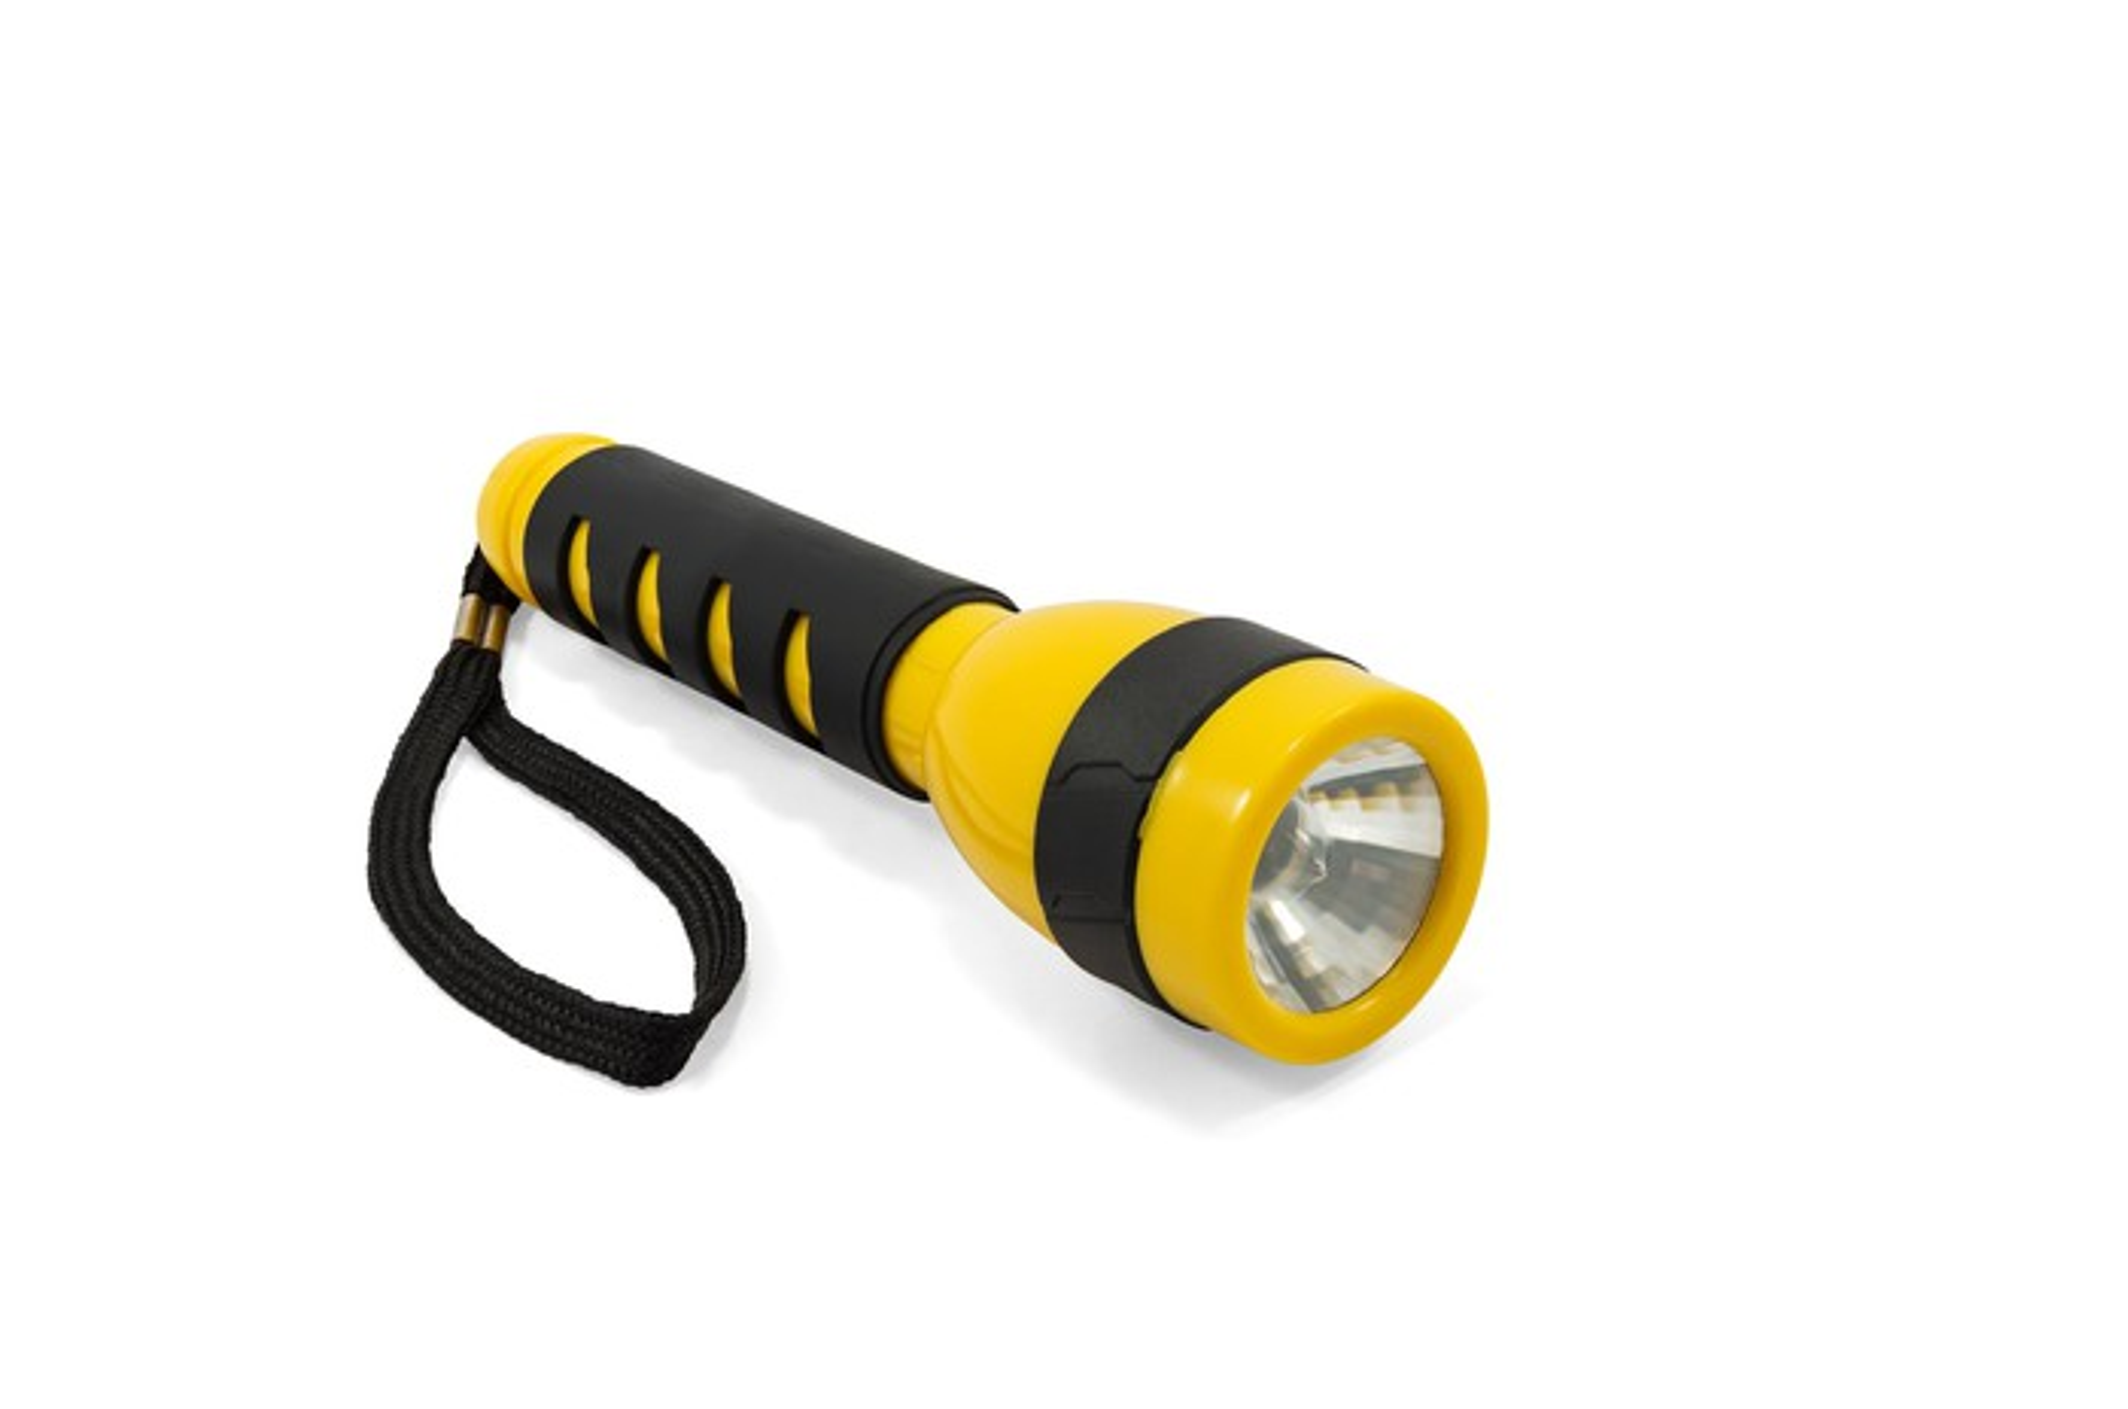 A yellow and black flashlight.